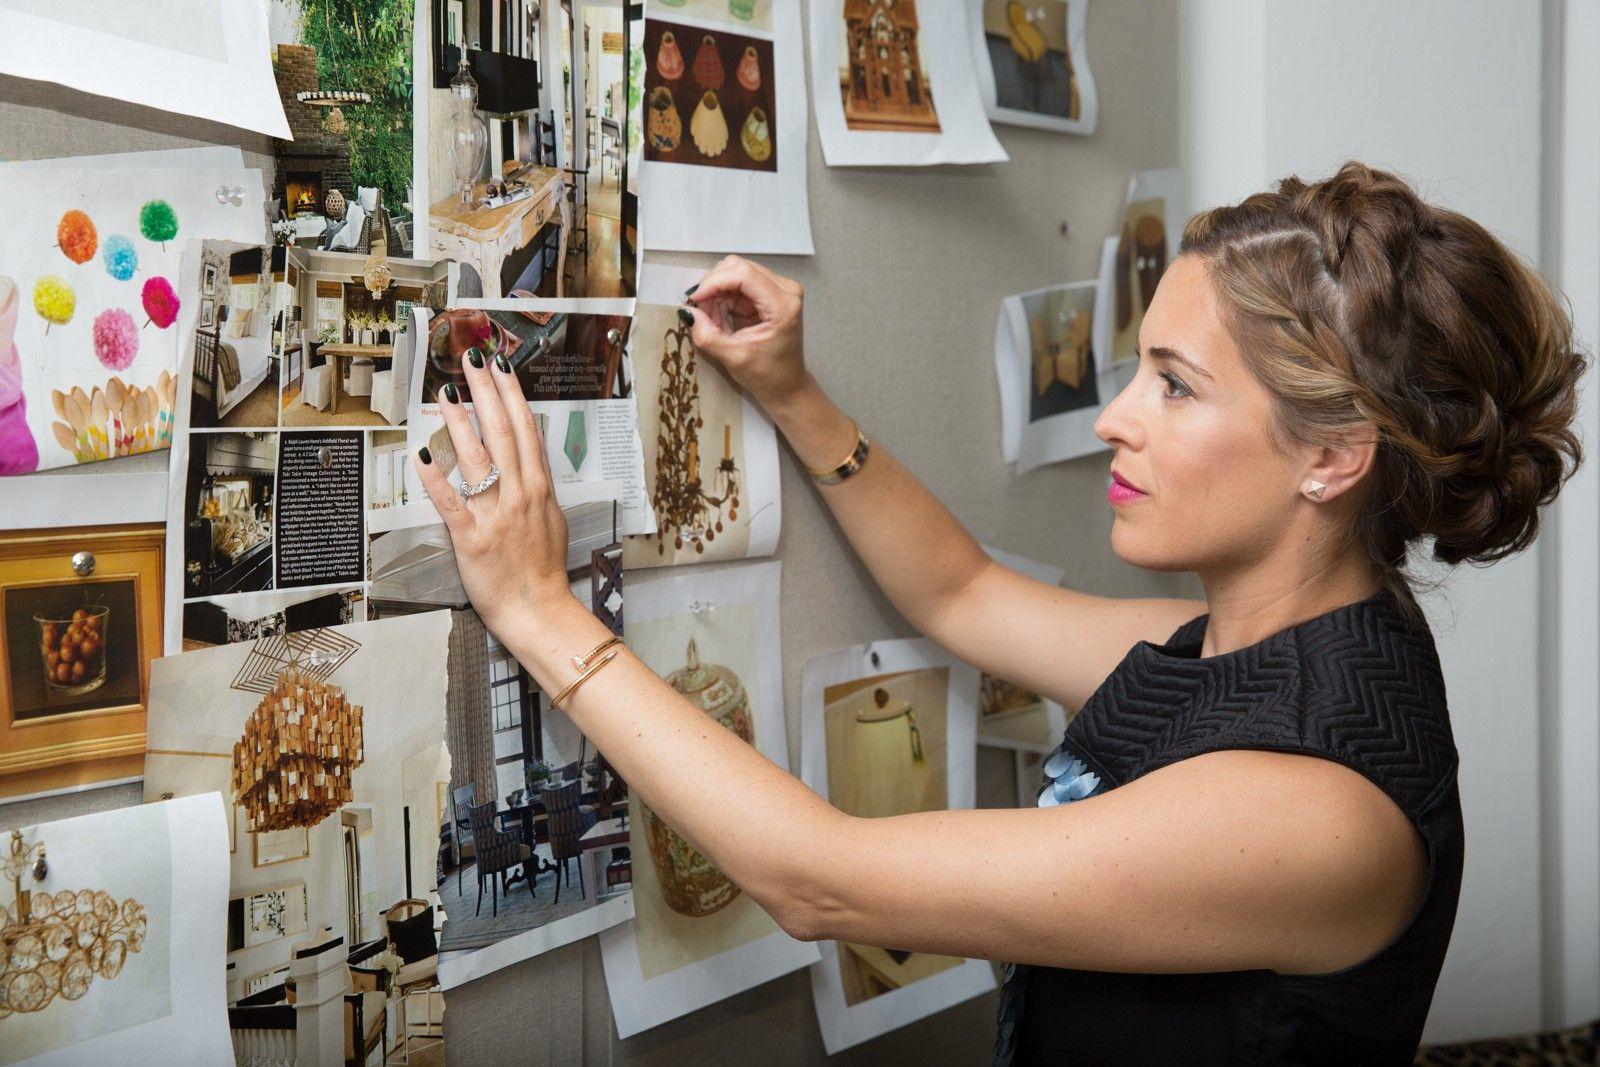 Women in technology claire cain miller women making